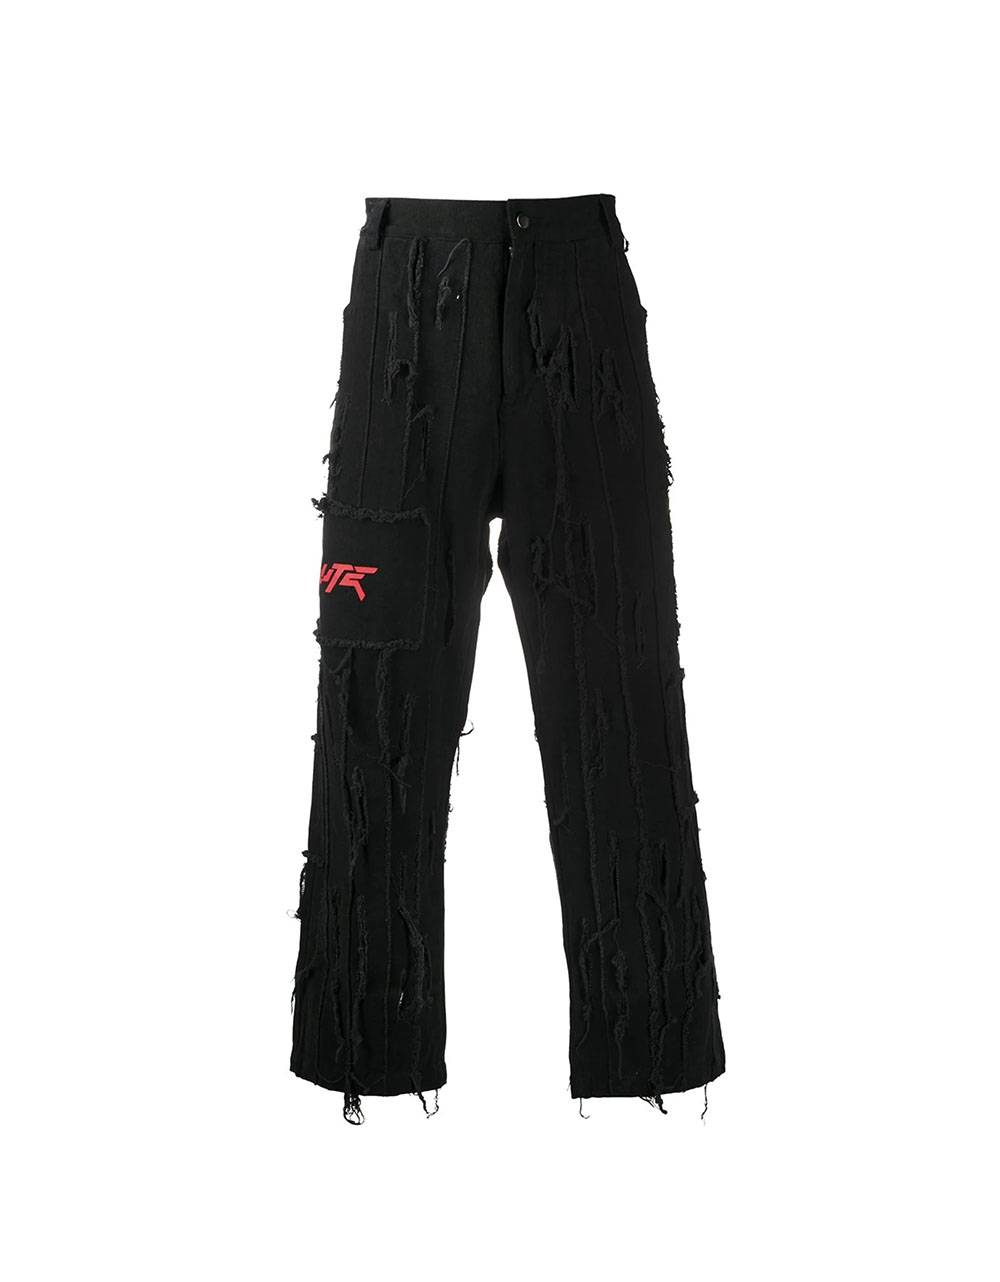 Salute HK Washed Damage denim pants - black Salute HK Jeans 163,11€